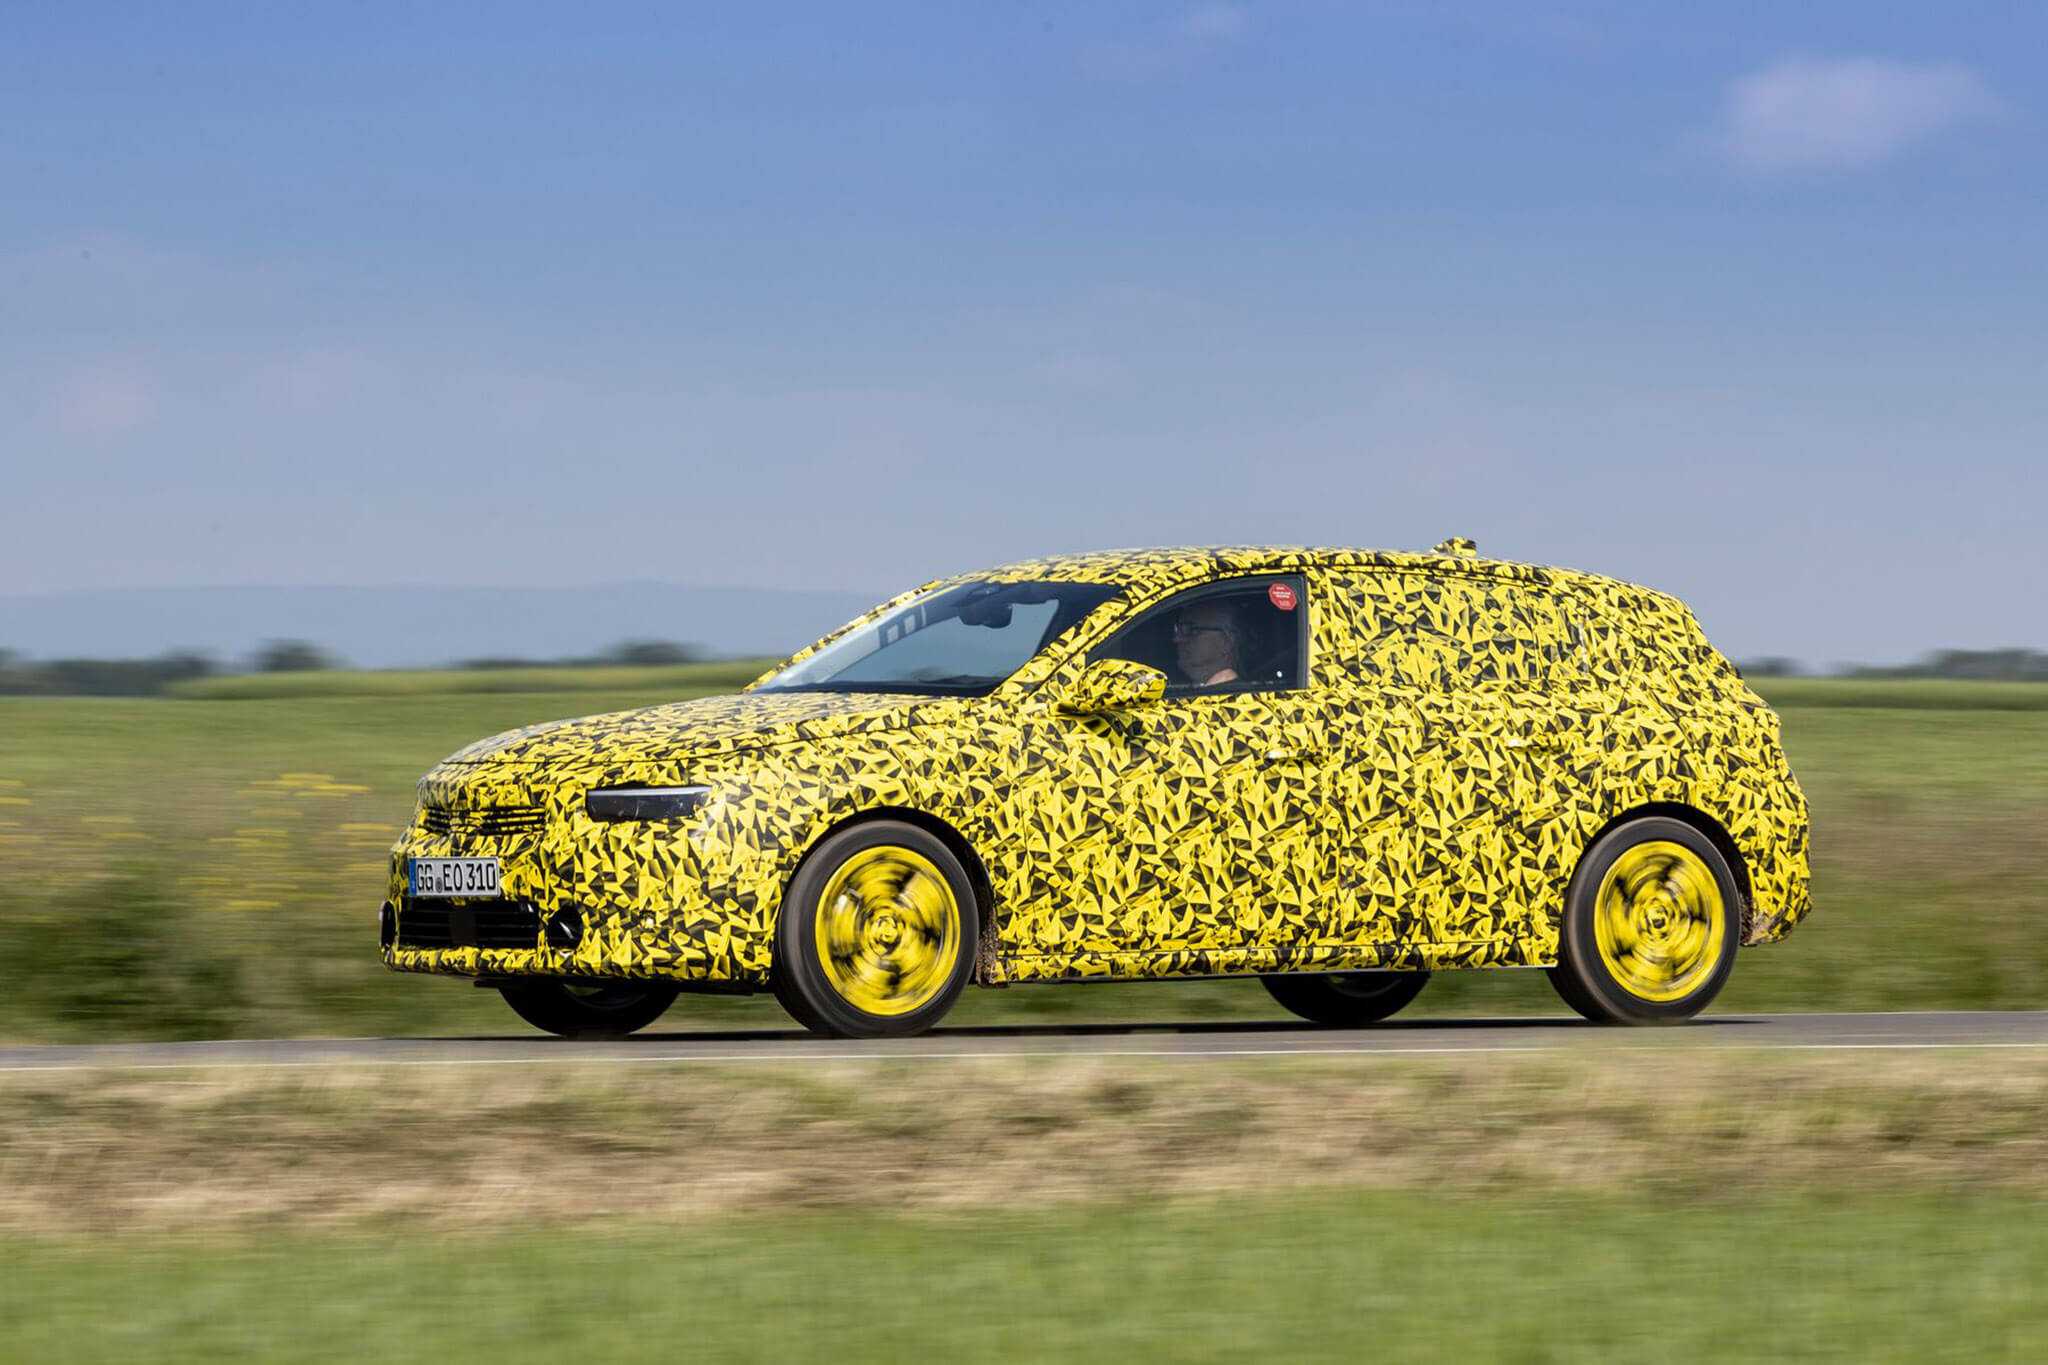 Opel Astra L protótipo